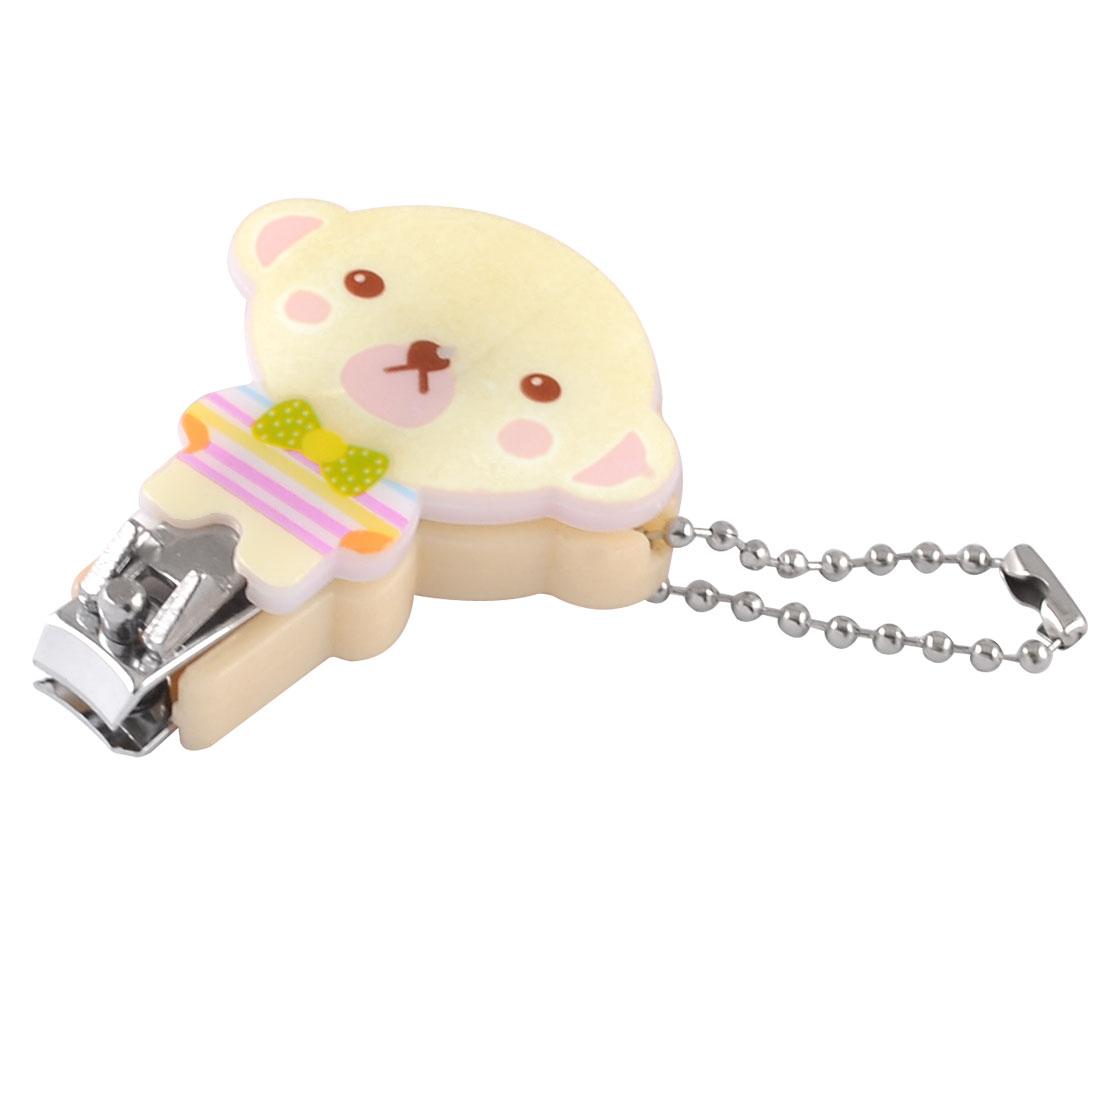 Mini Cartoon Bear Design Peachpuff Plastic Metal Nail Toe Clipper w Key Ring